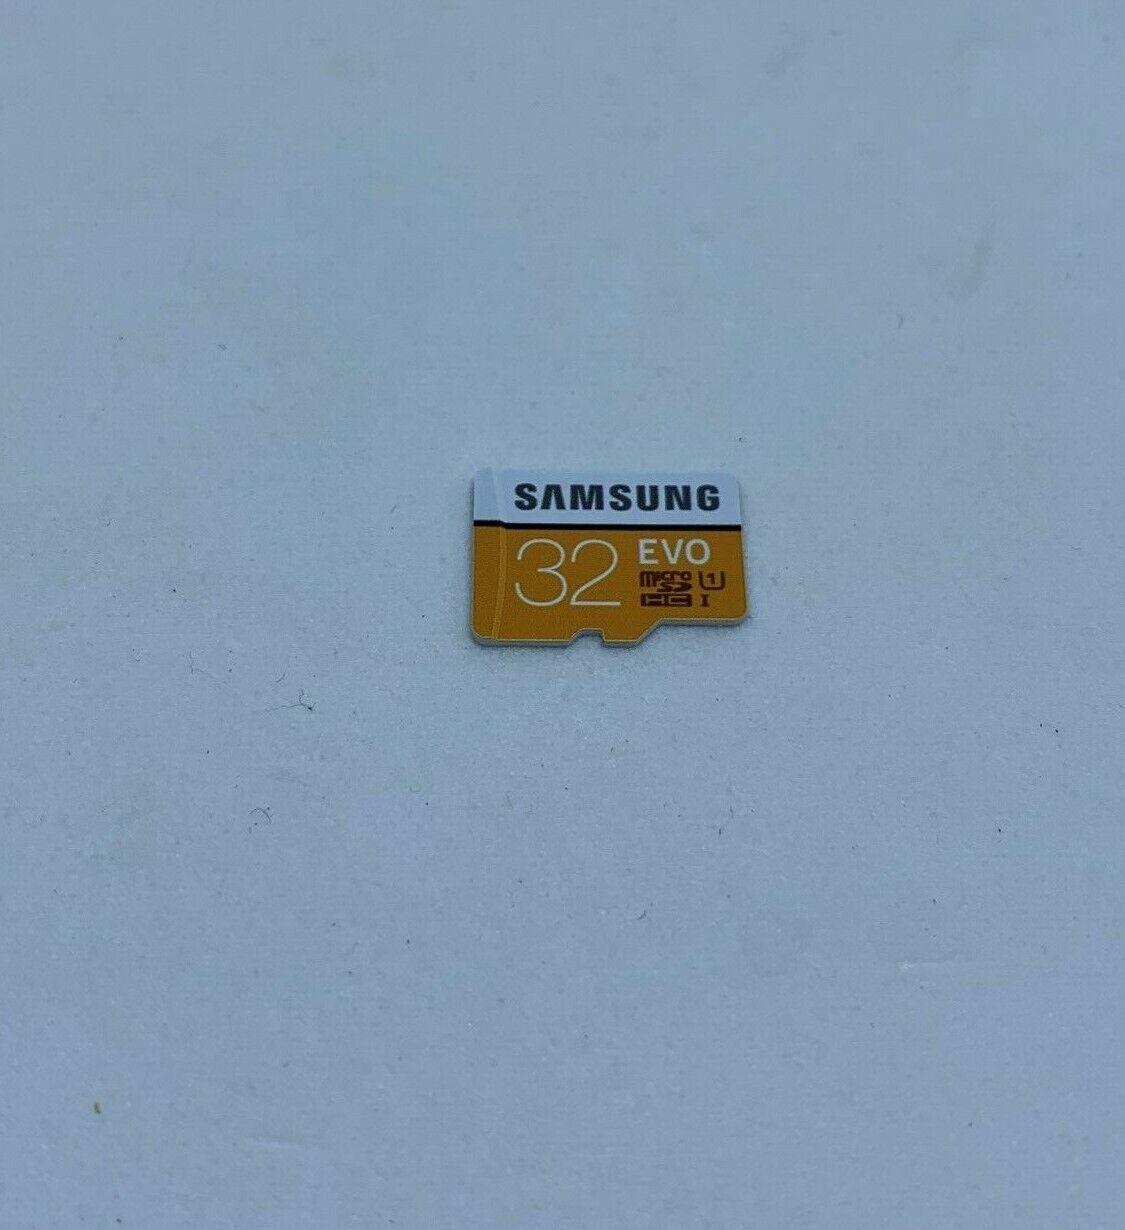 Samsung 95MB/s  MicroSD EVO Memory Card with Adapter 32 GB